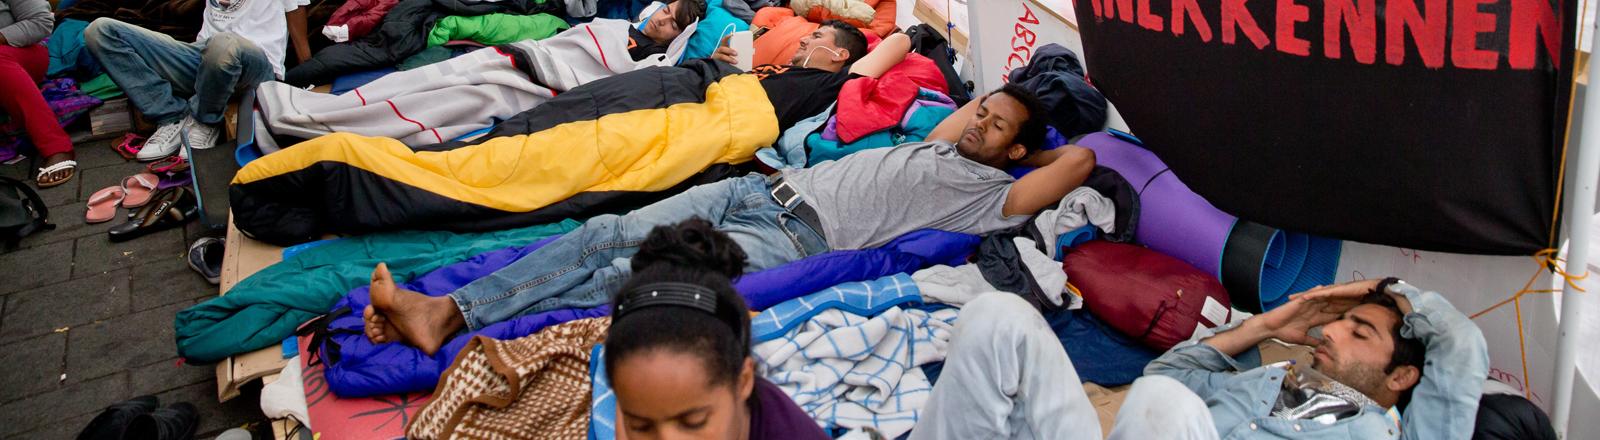 Flüchtlinge beim Hungerstreik in Nürnberg.